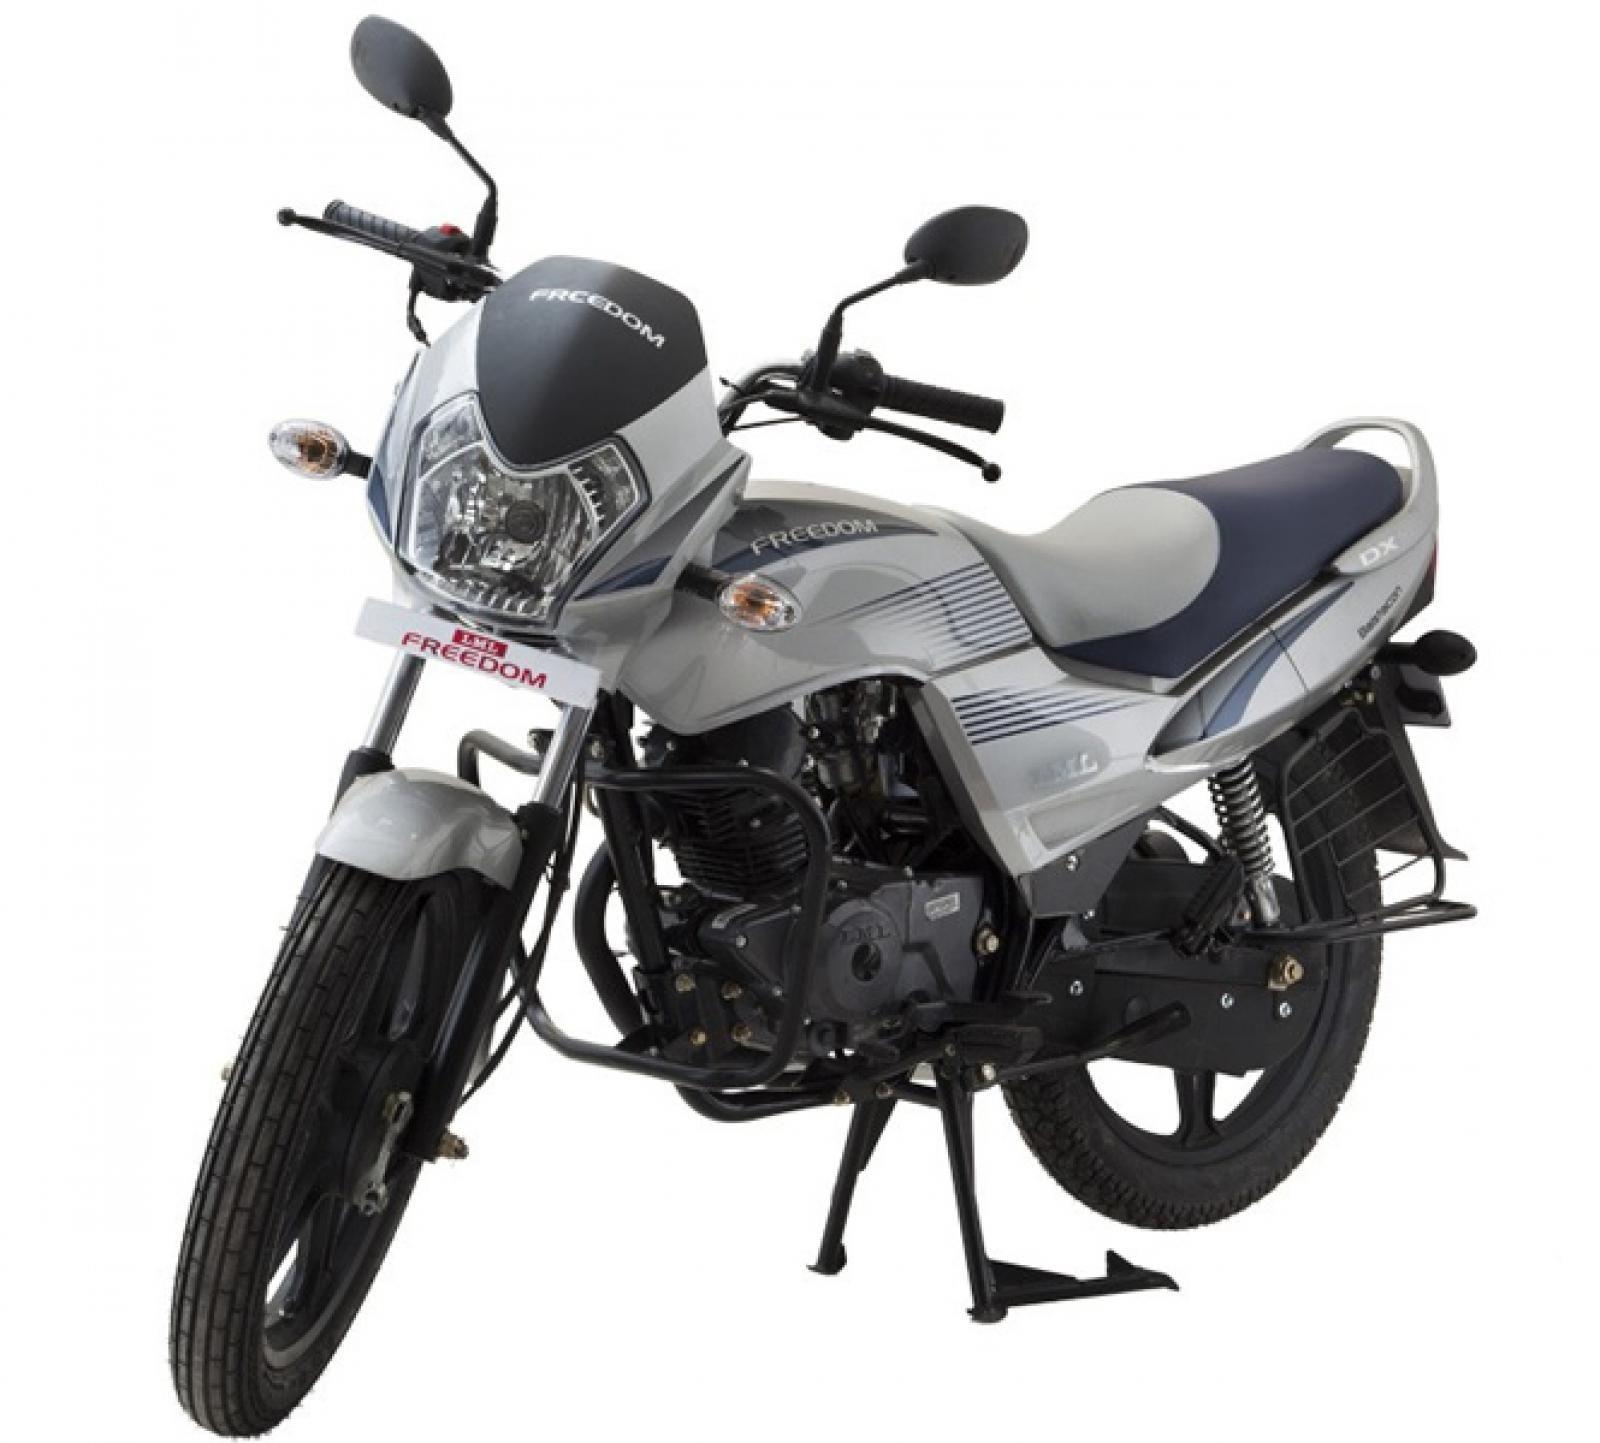 Lml lml bikes lml bike price lml bikes in india 100bikes